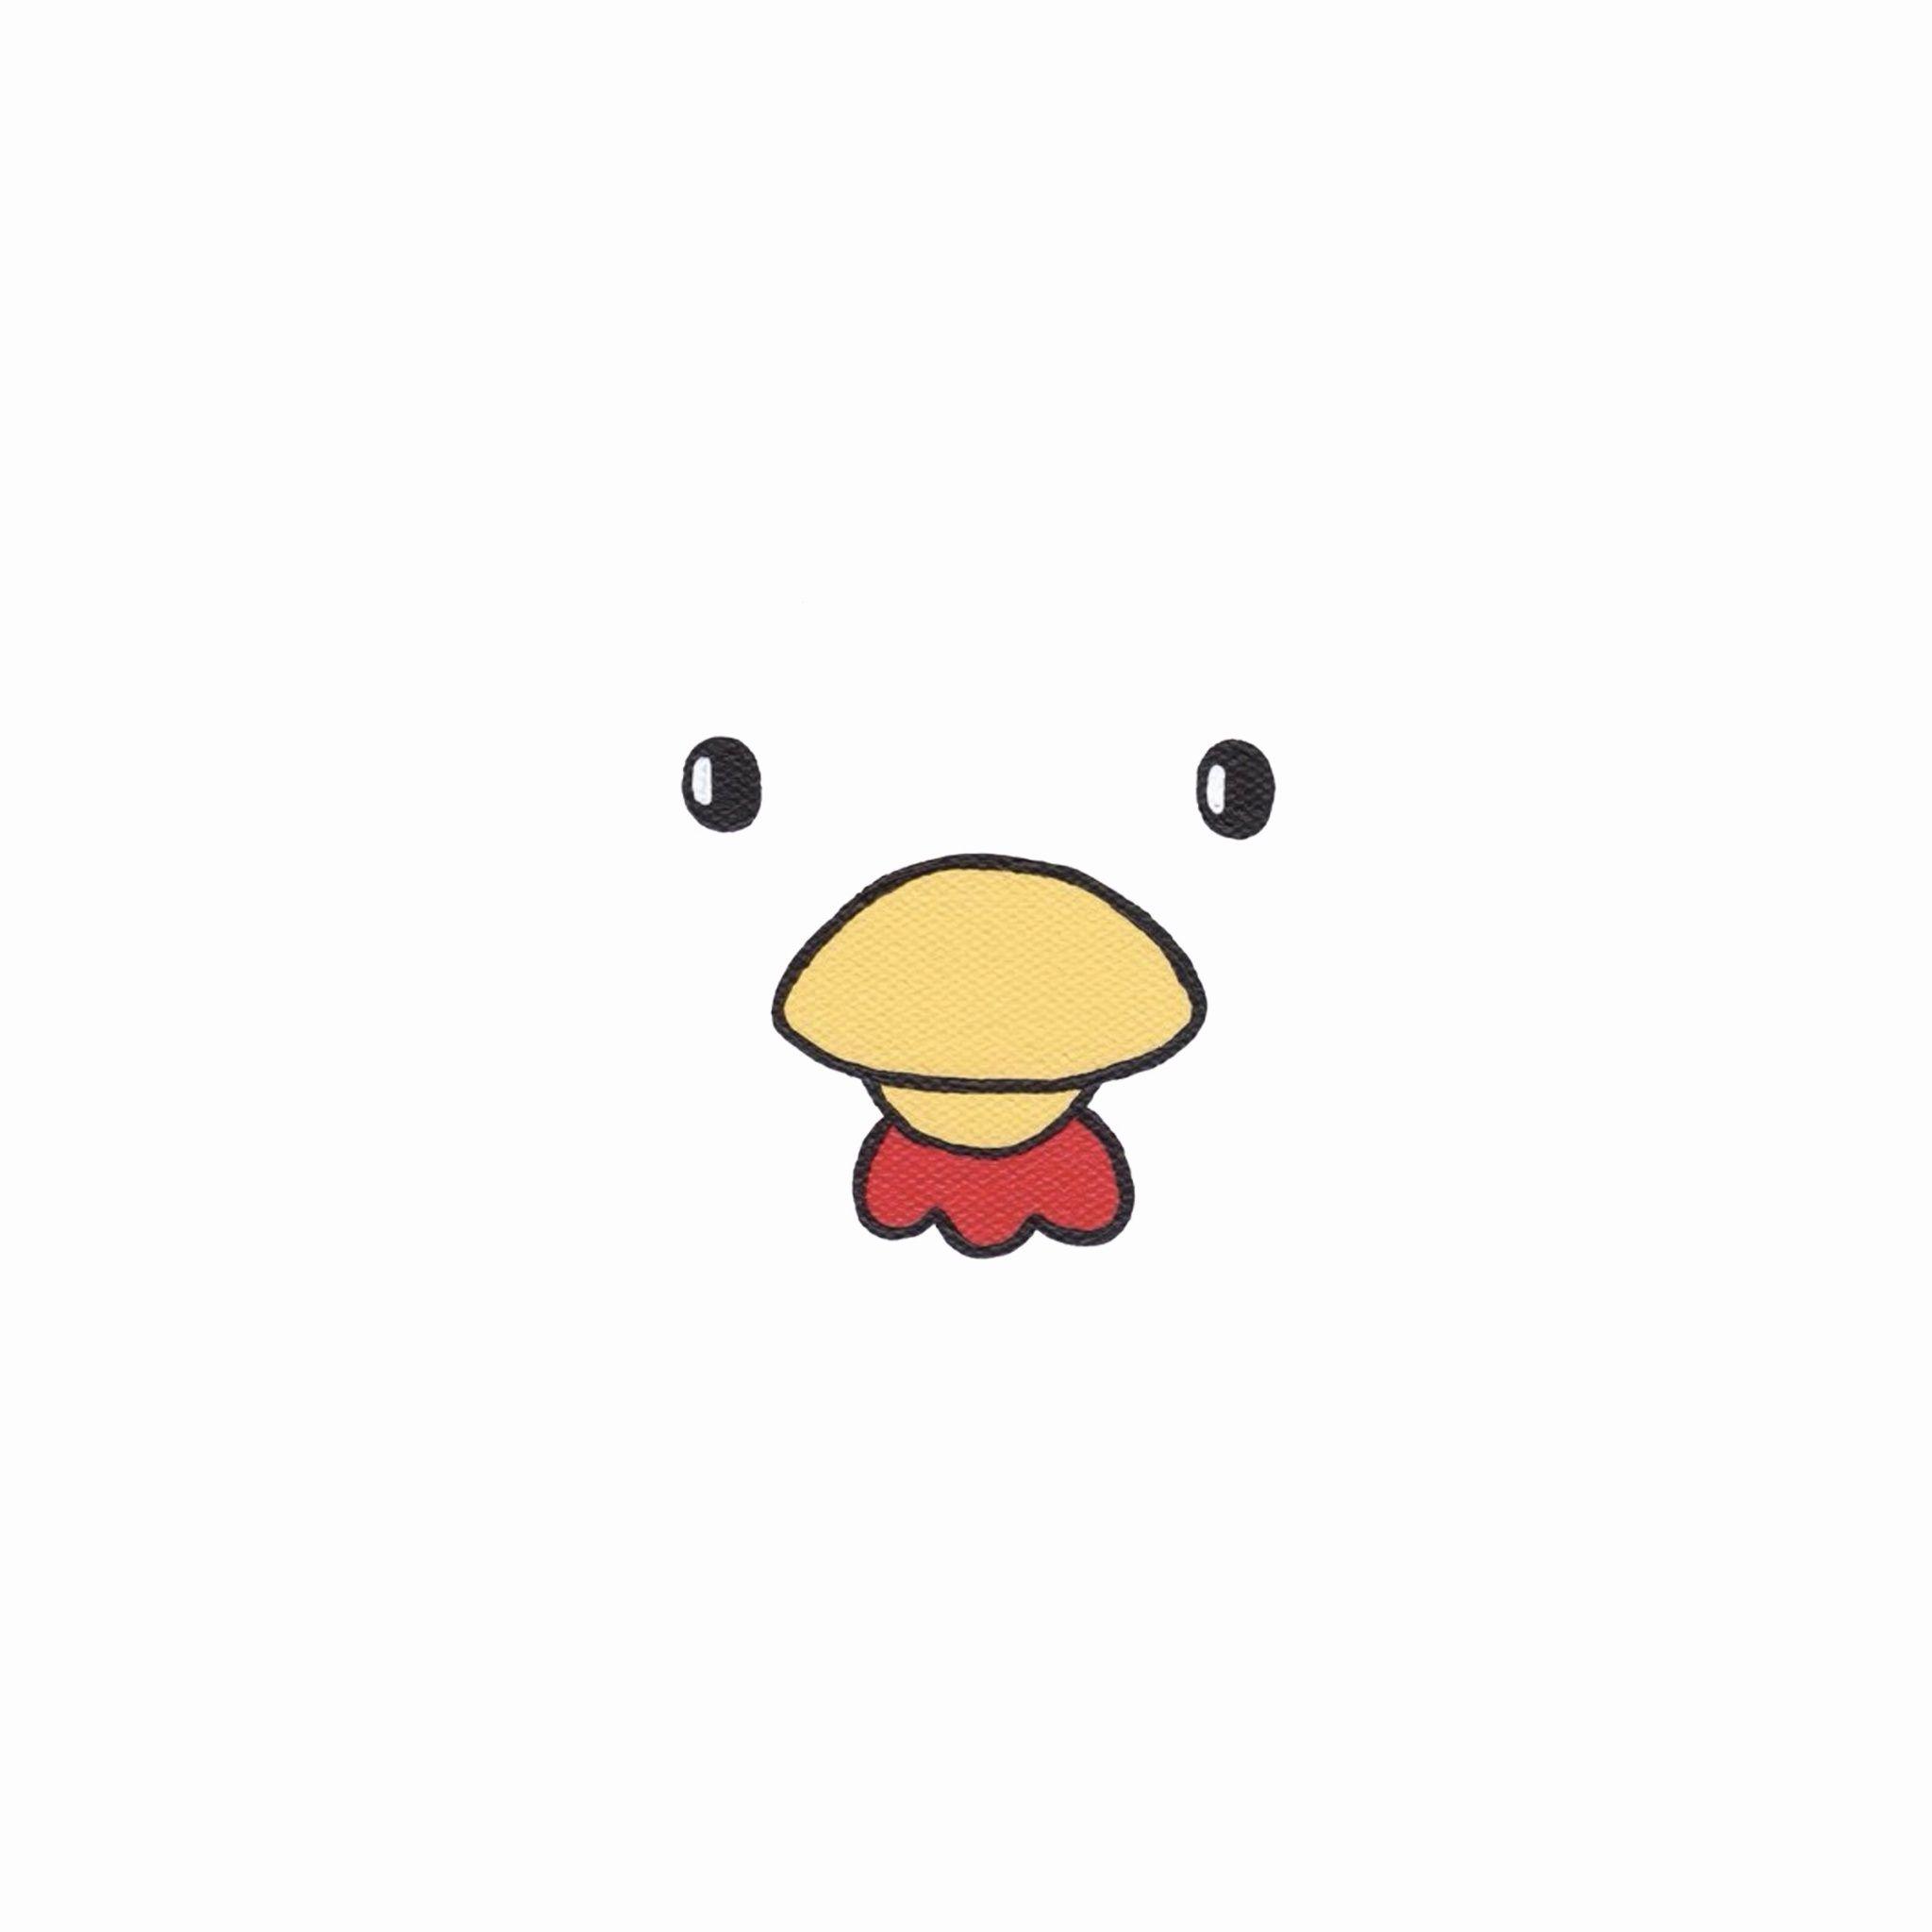 Duckling Cute Wallpapers For Ipad Ipad Mini Wallpaper Wallpaper Iphone Cute